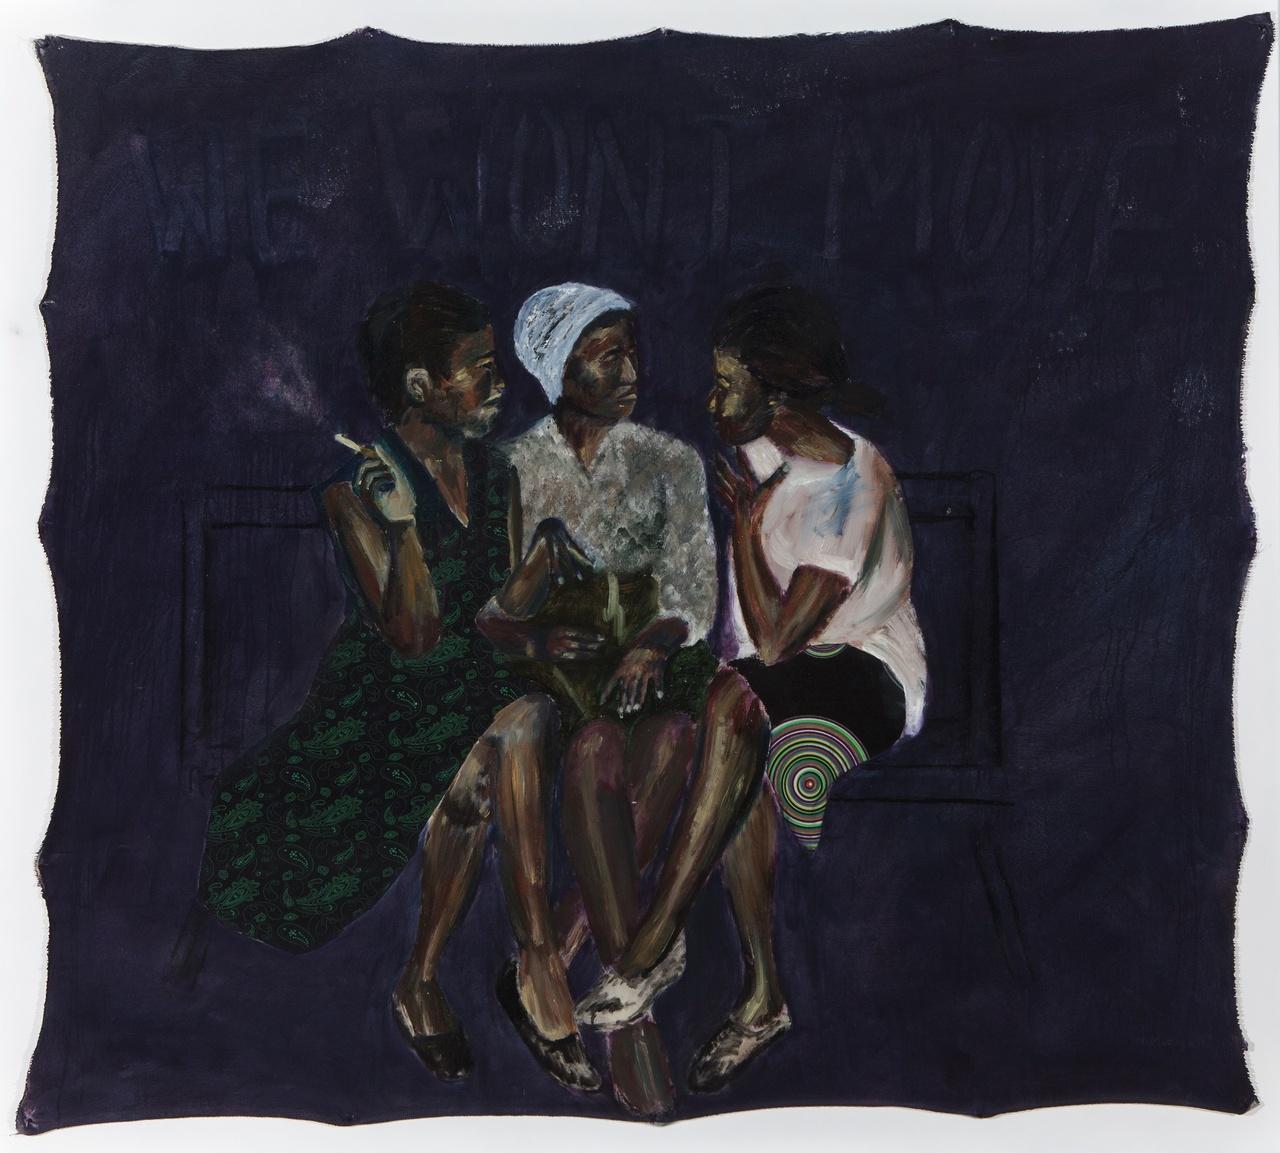 Neo Matloga, Bo mma sebotsana, 2017, oil on collage on canvas, 145x160 cm, courtesy Christopher Moller Gallery